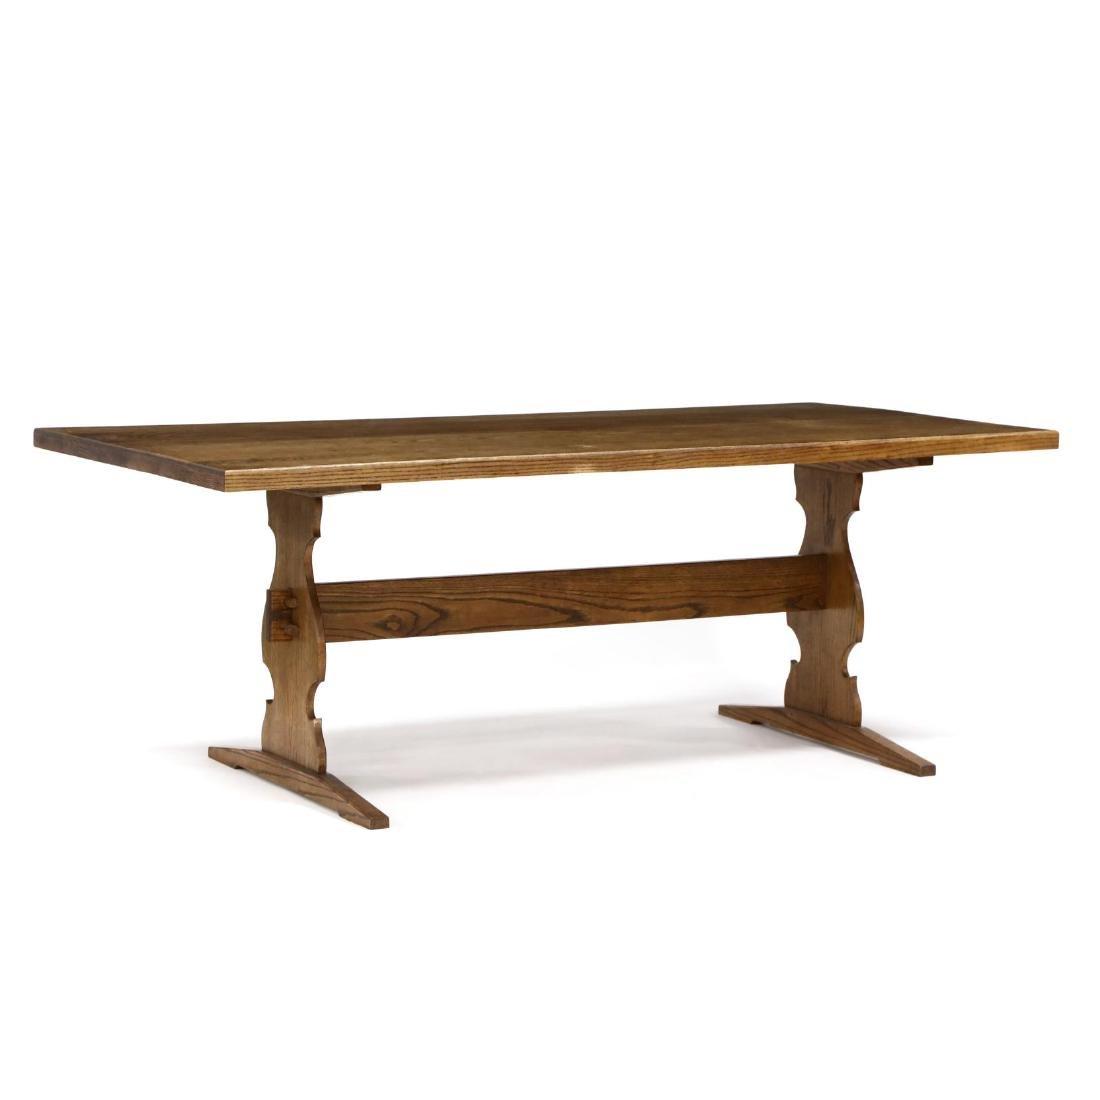 Bob Trotman, Custom Oak Trestle Base Dining Table